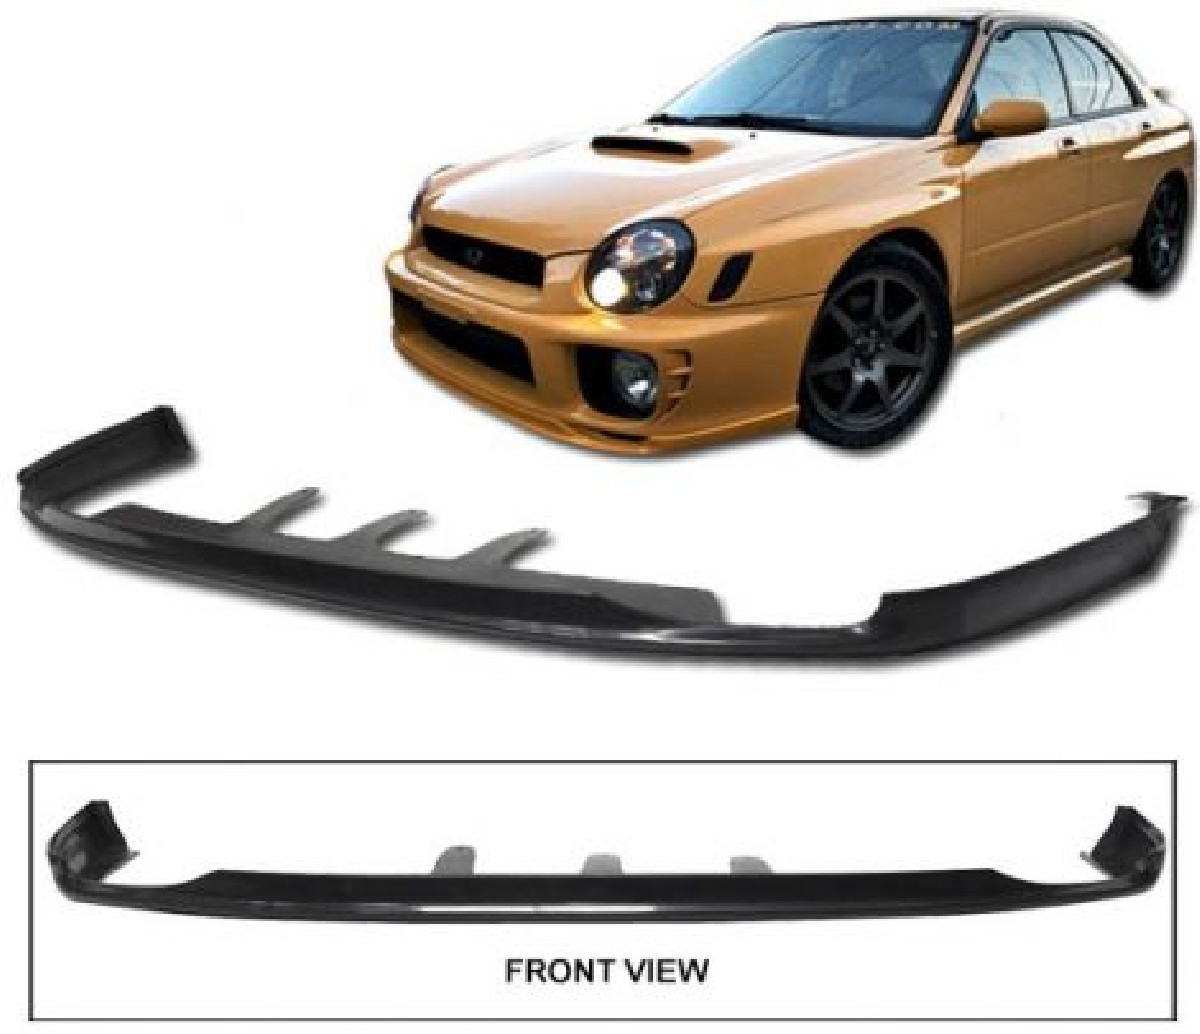 Subaru Impreza 01-03 C-West 2 Urethane Front Bumperlip